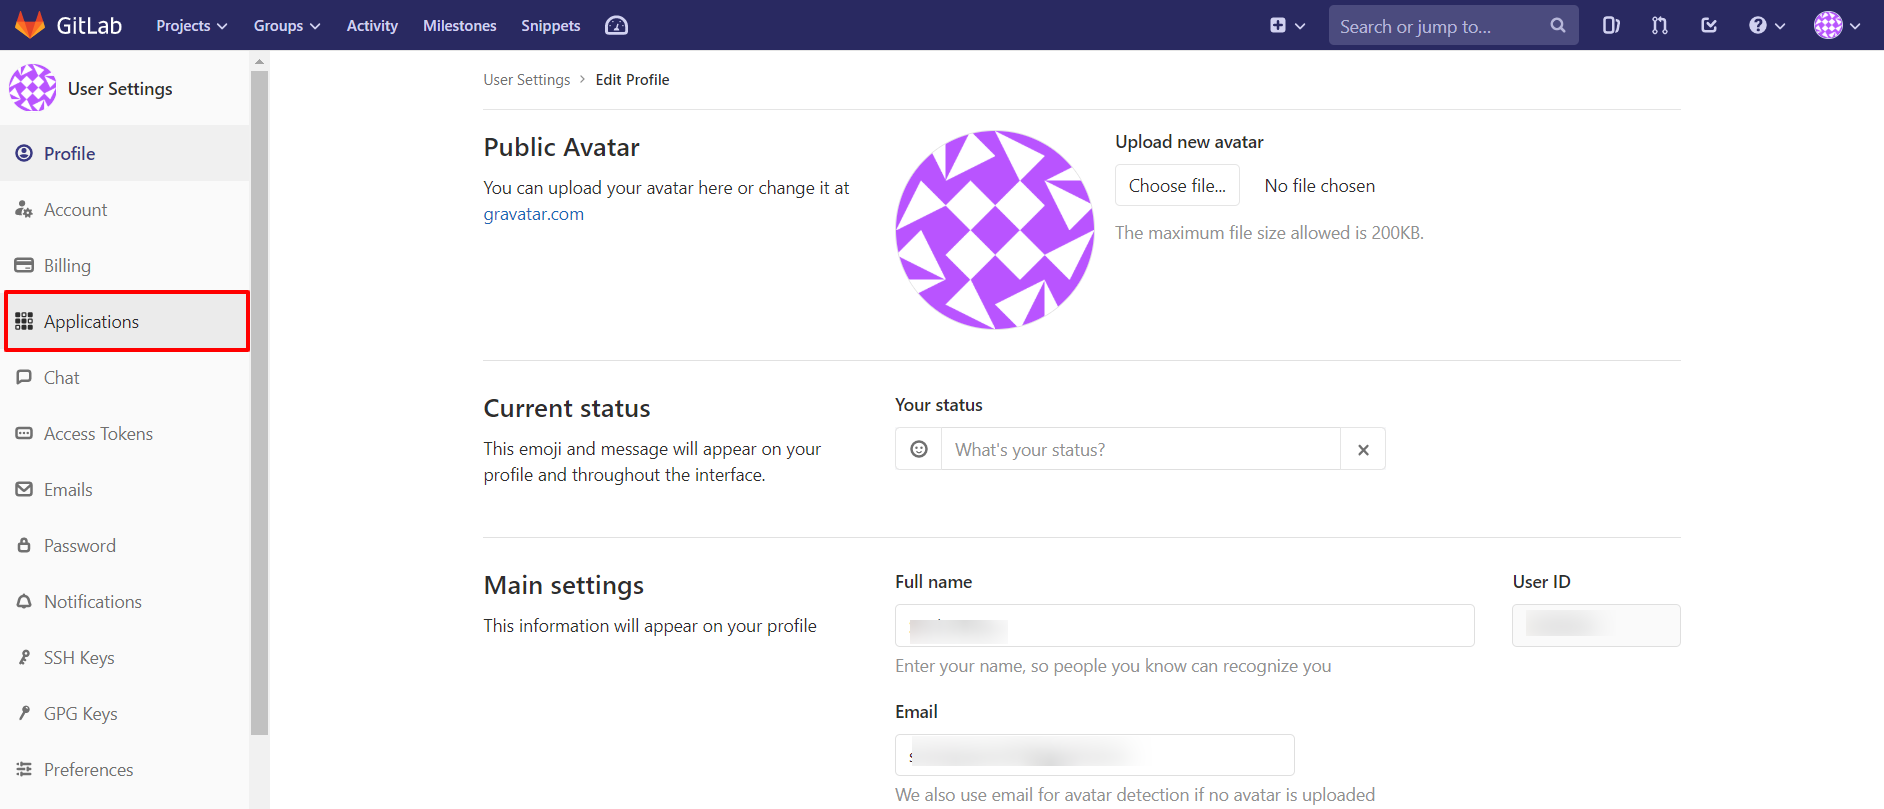 OAuth/OpenID/OIDC Single Sign On (SSO), GitLab SSO Login Create app